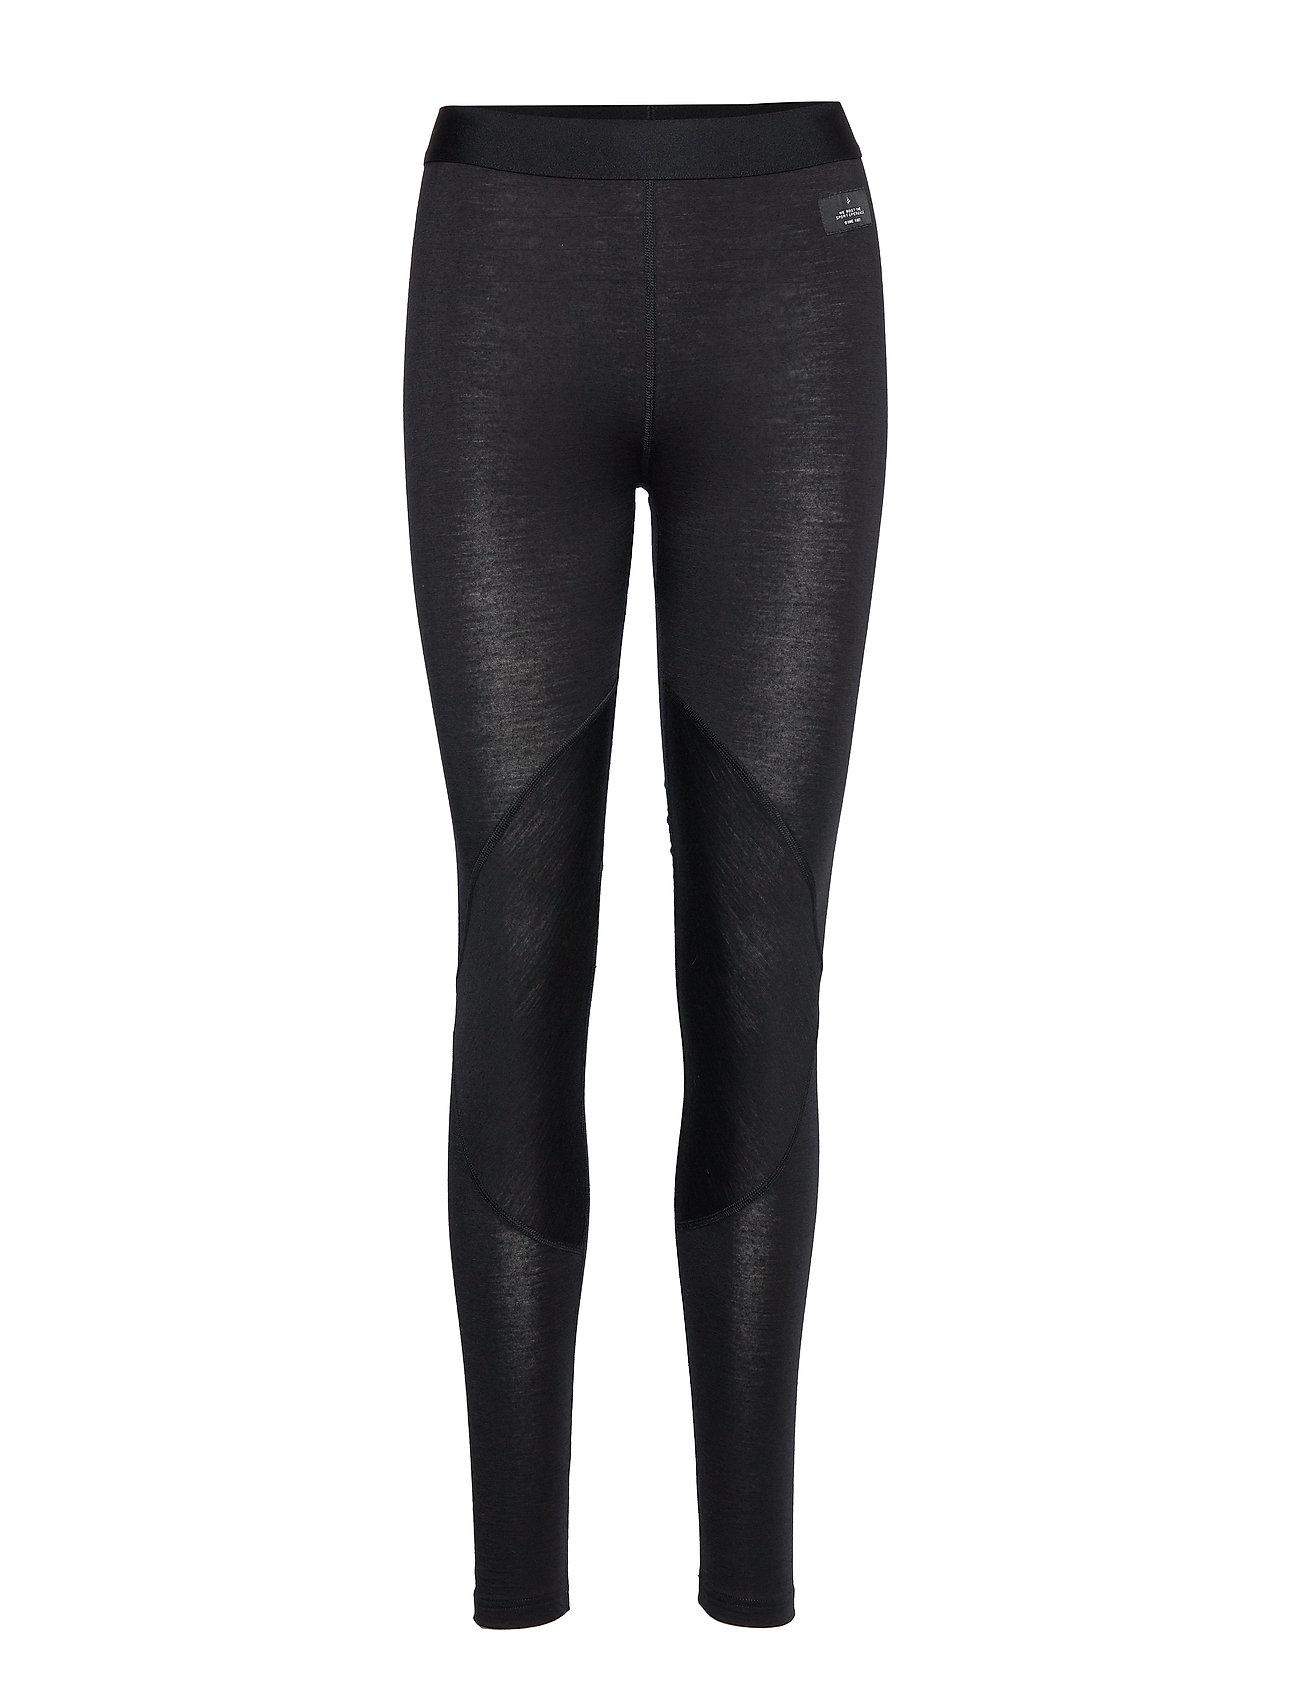 Craft MERINO LIGHTWEIGHT PANTS  - BLACK